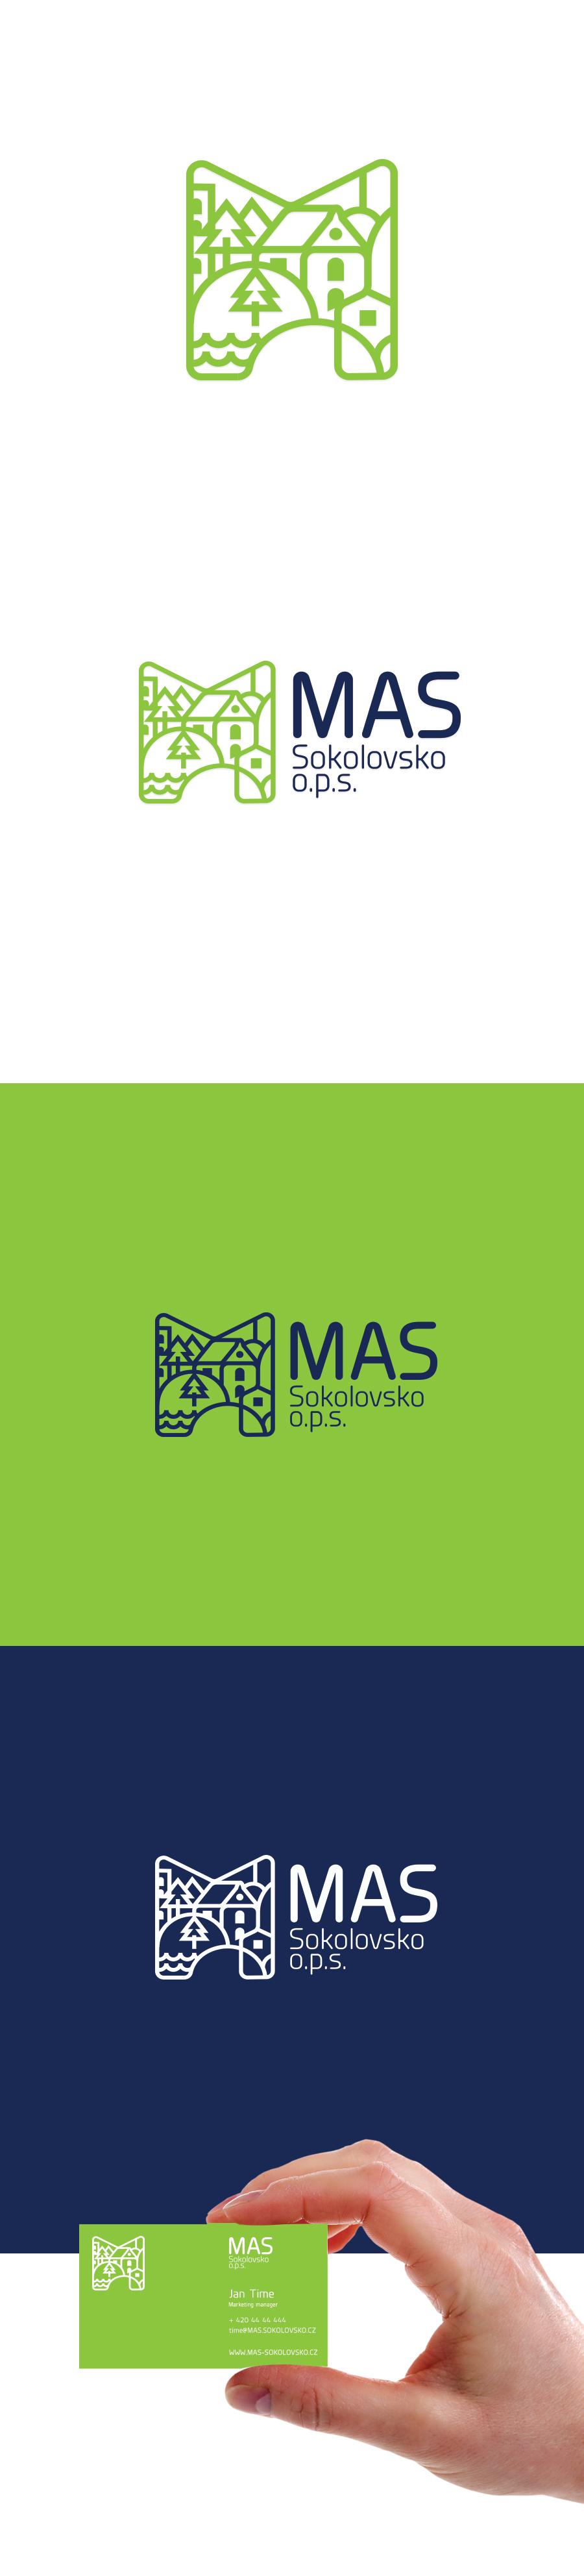 [Logo by Umbrolla]